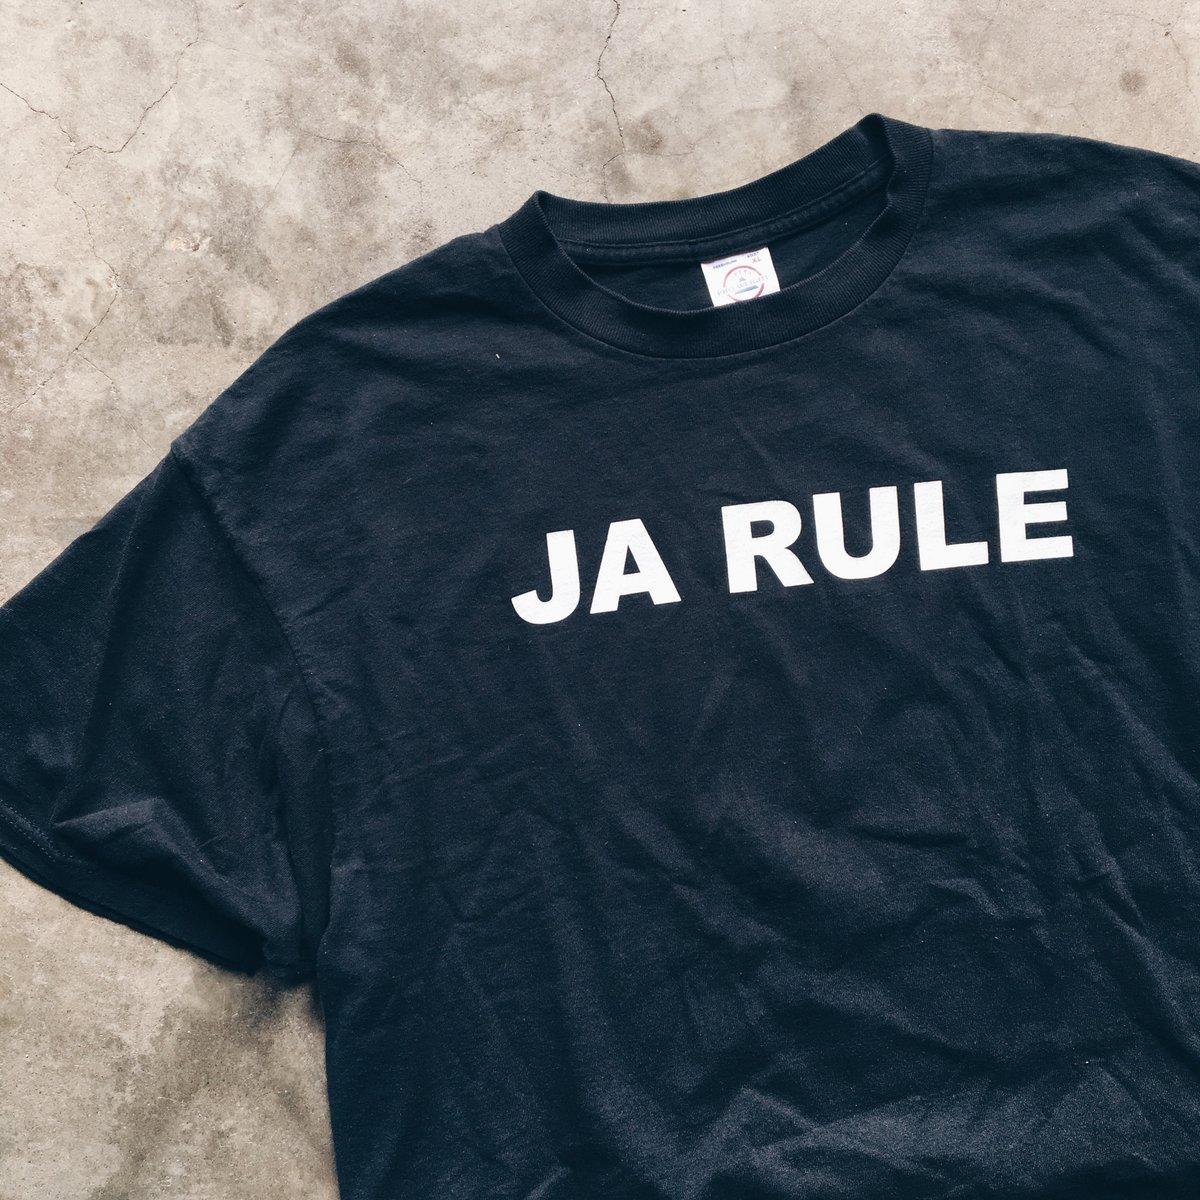 Image of Original 2001 Ja Rule Pain Is Love Tee.